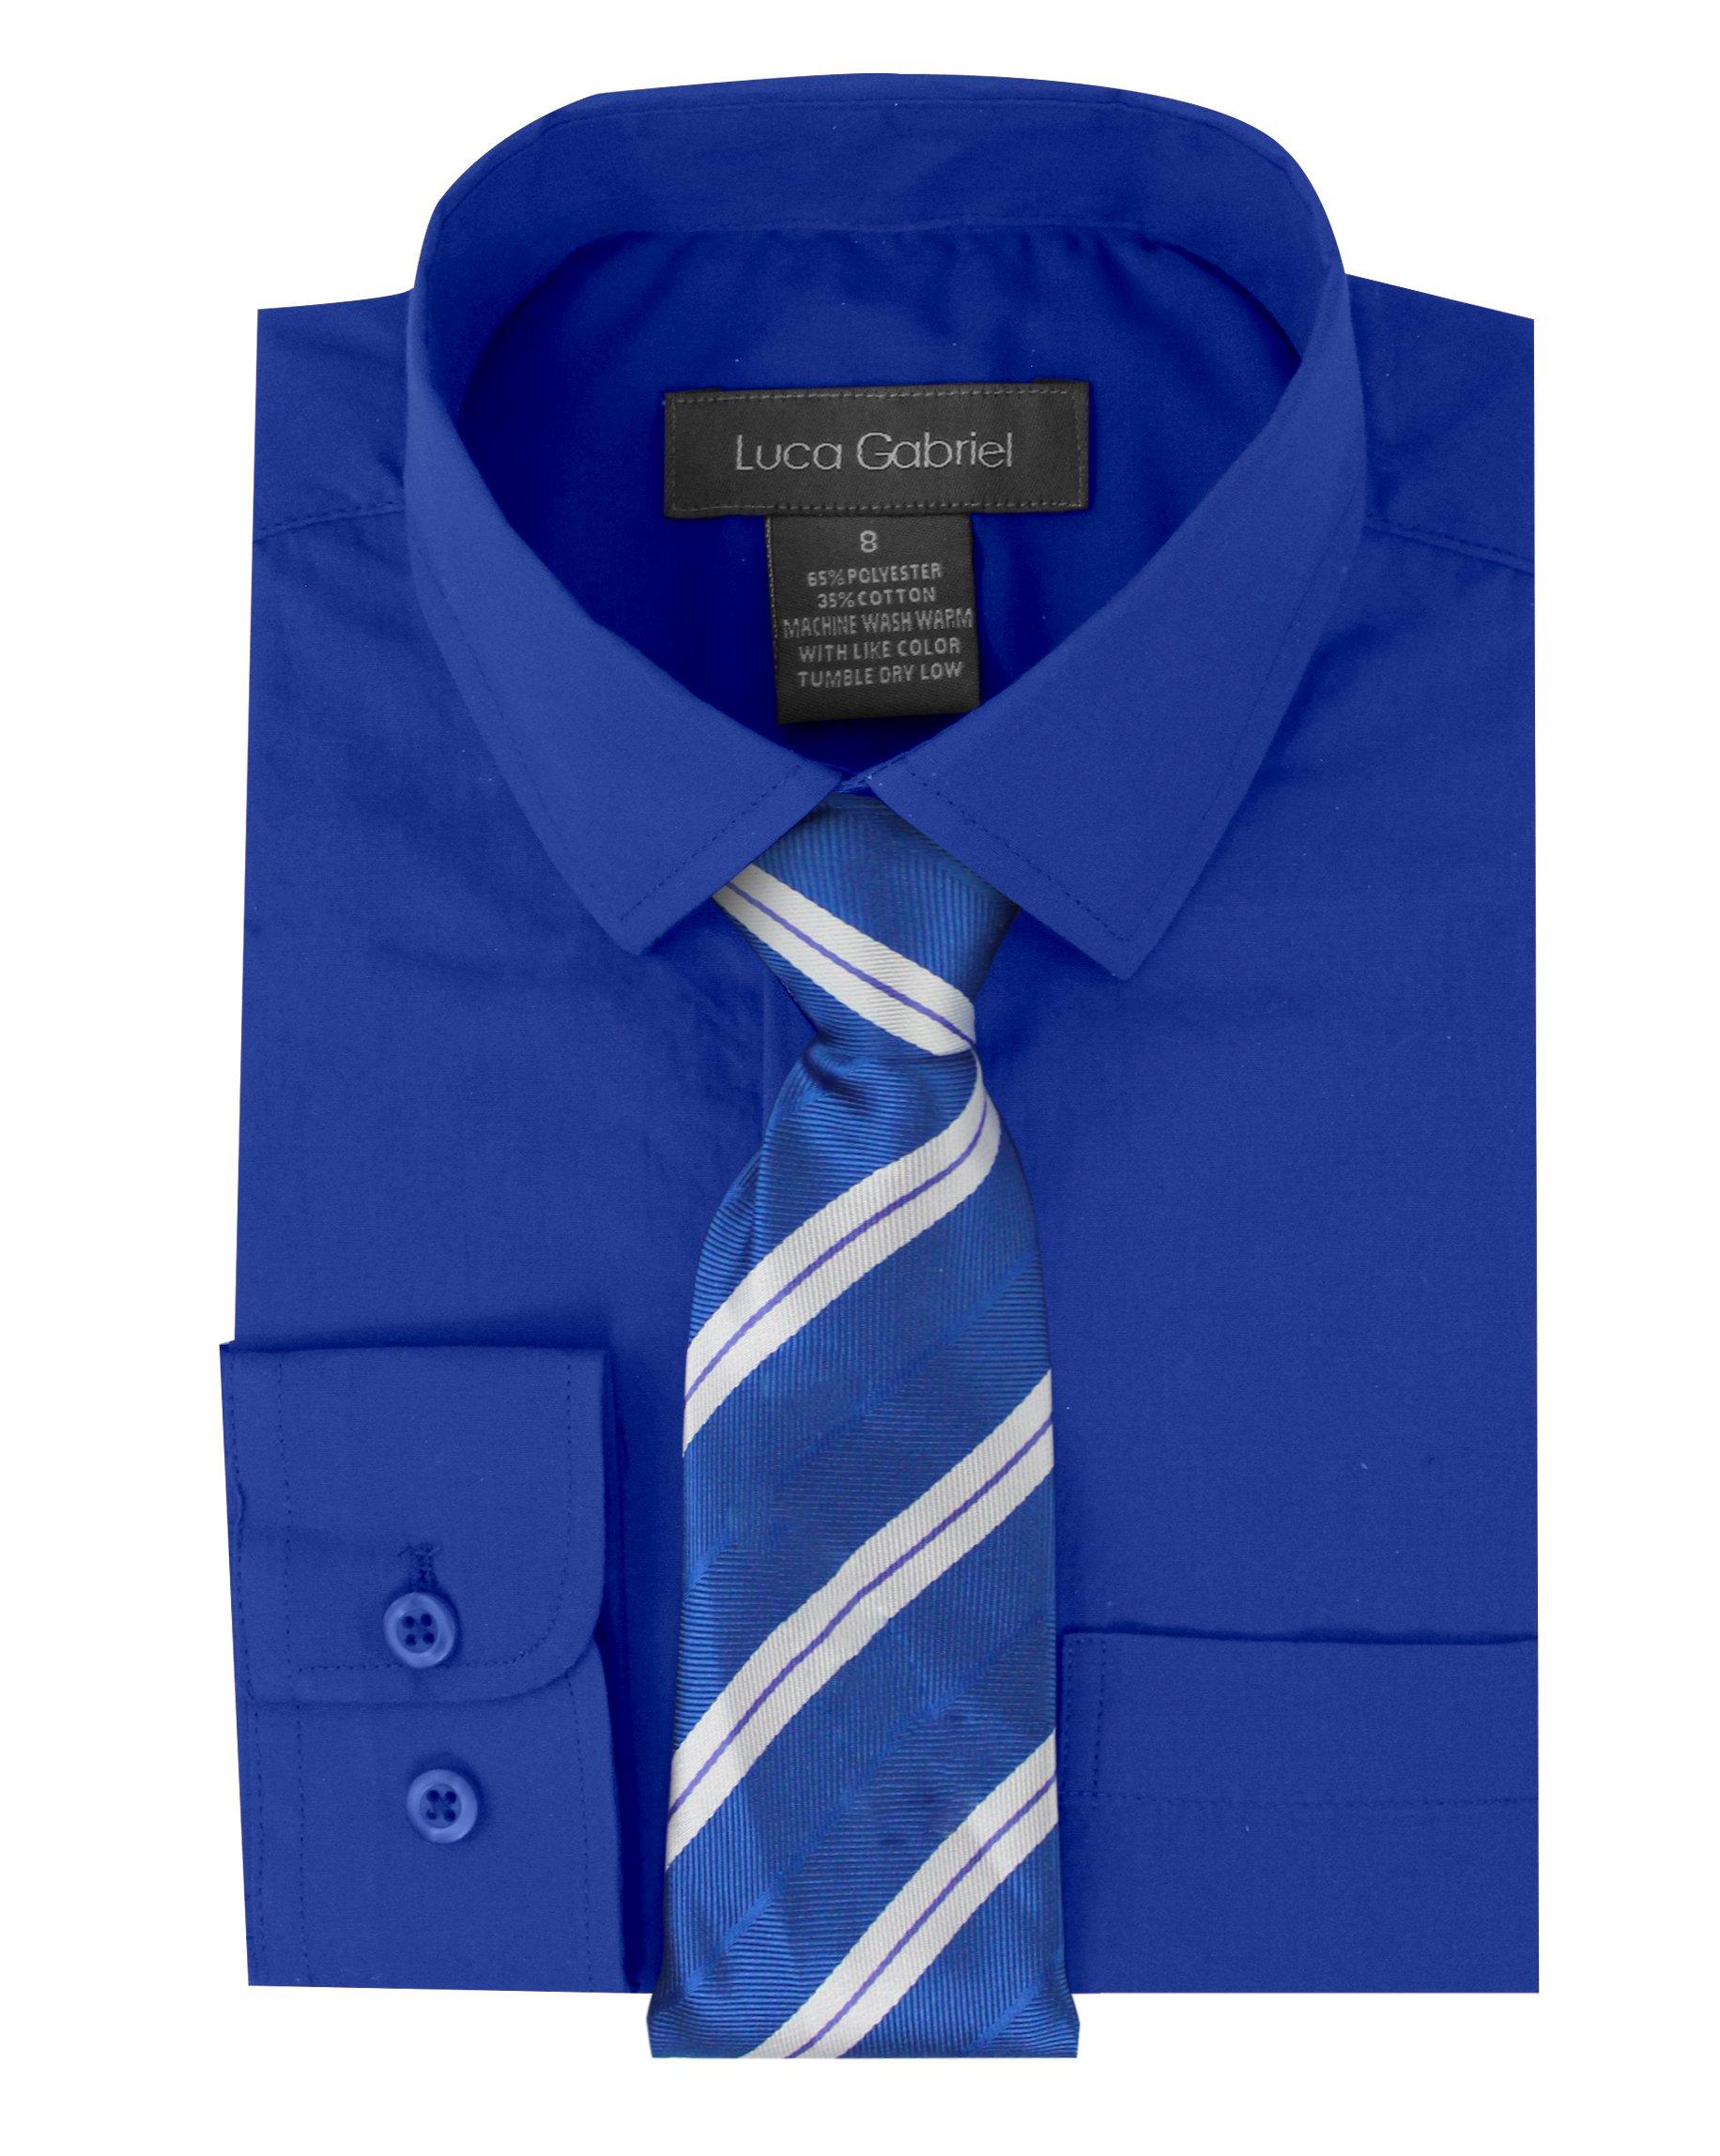 Luca Gabriel Toddler Boy's Long Sleeve Formal Button Down Dress Shirt & Tie Set - Royal Blue 3t